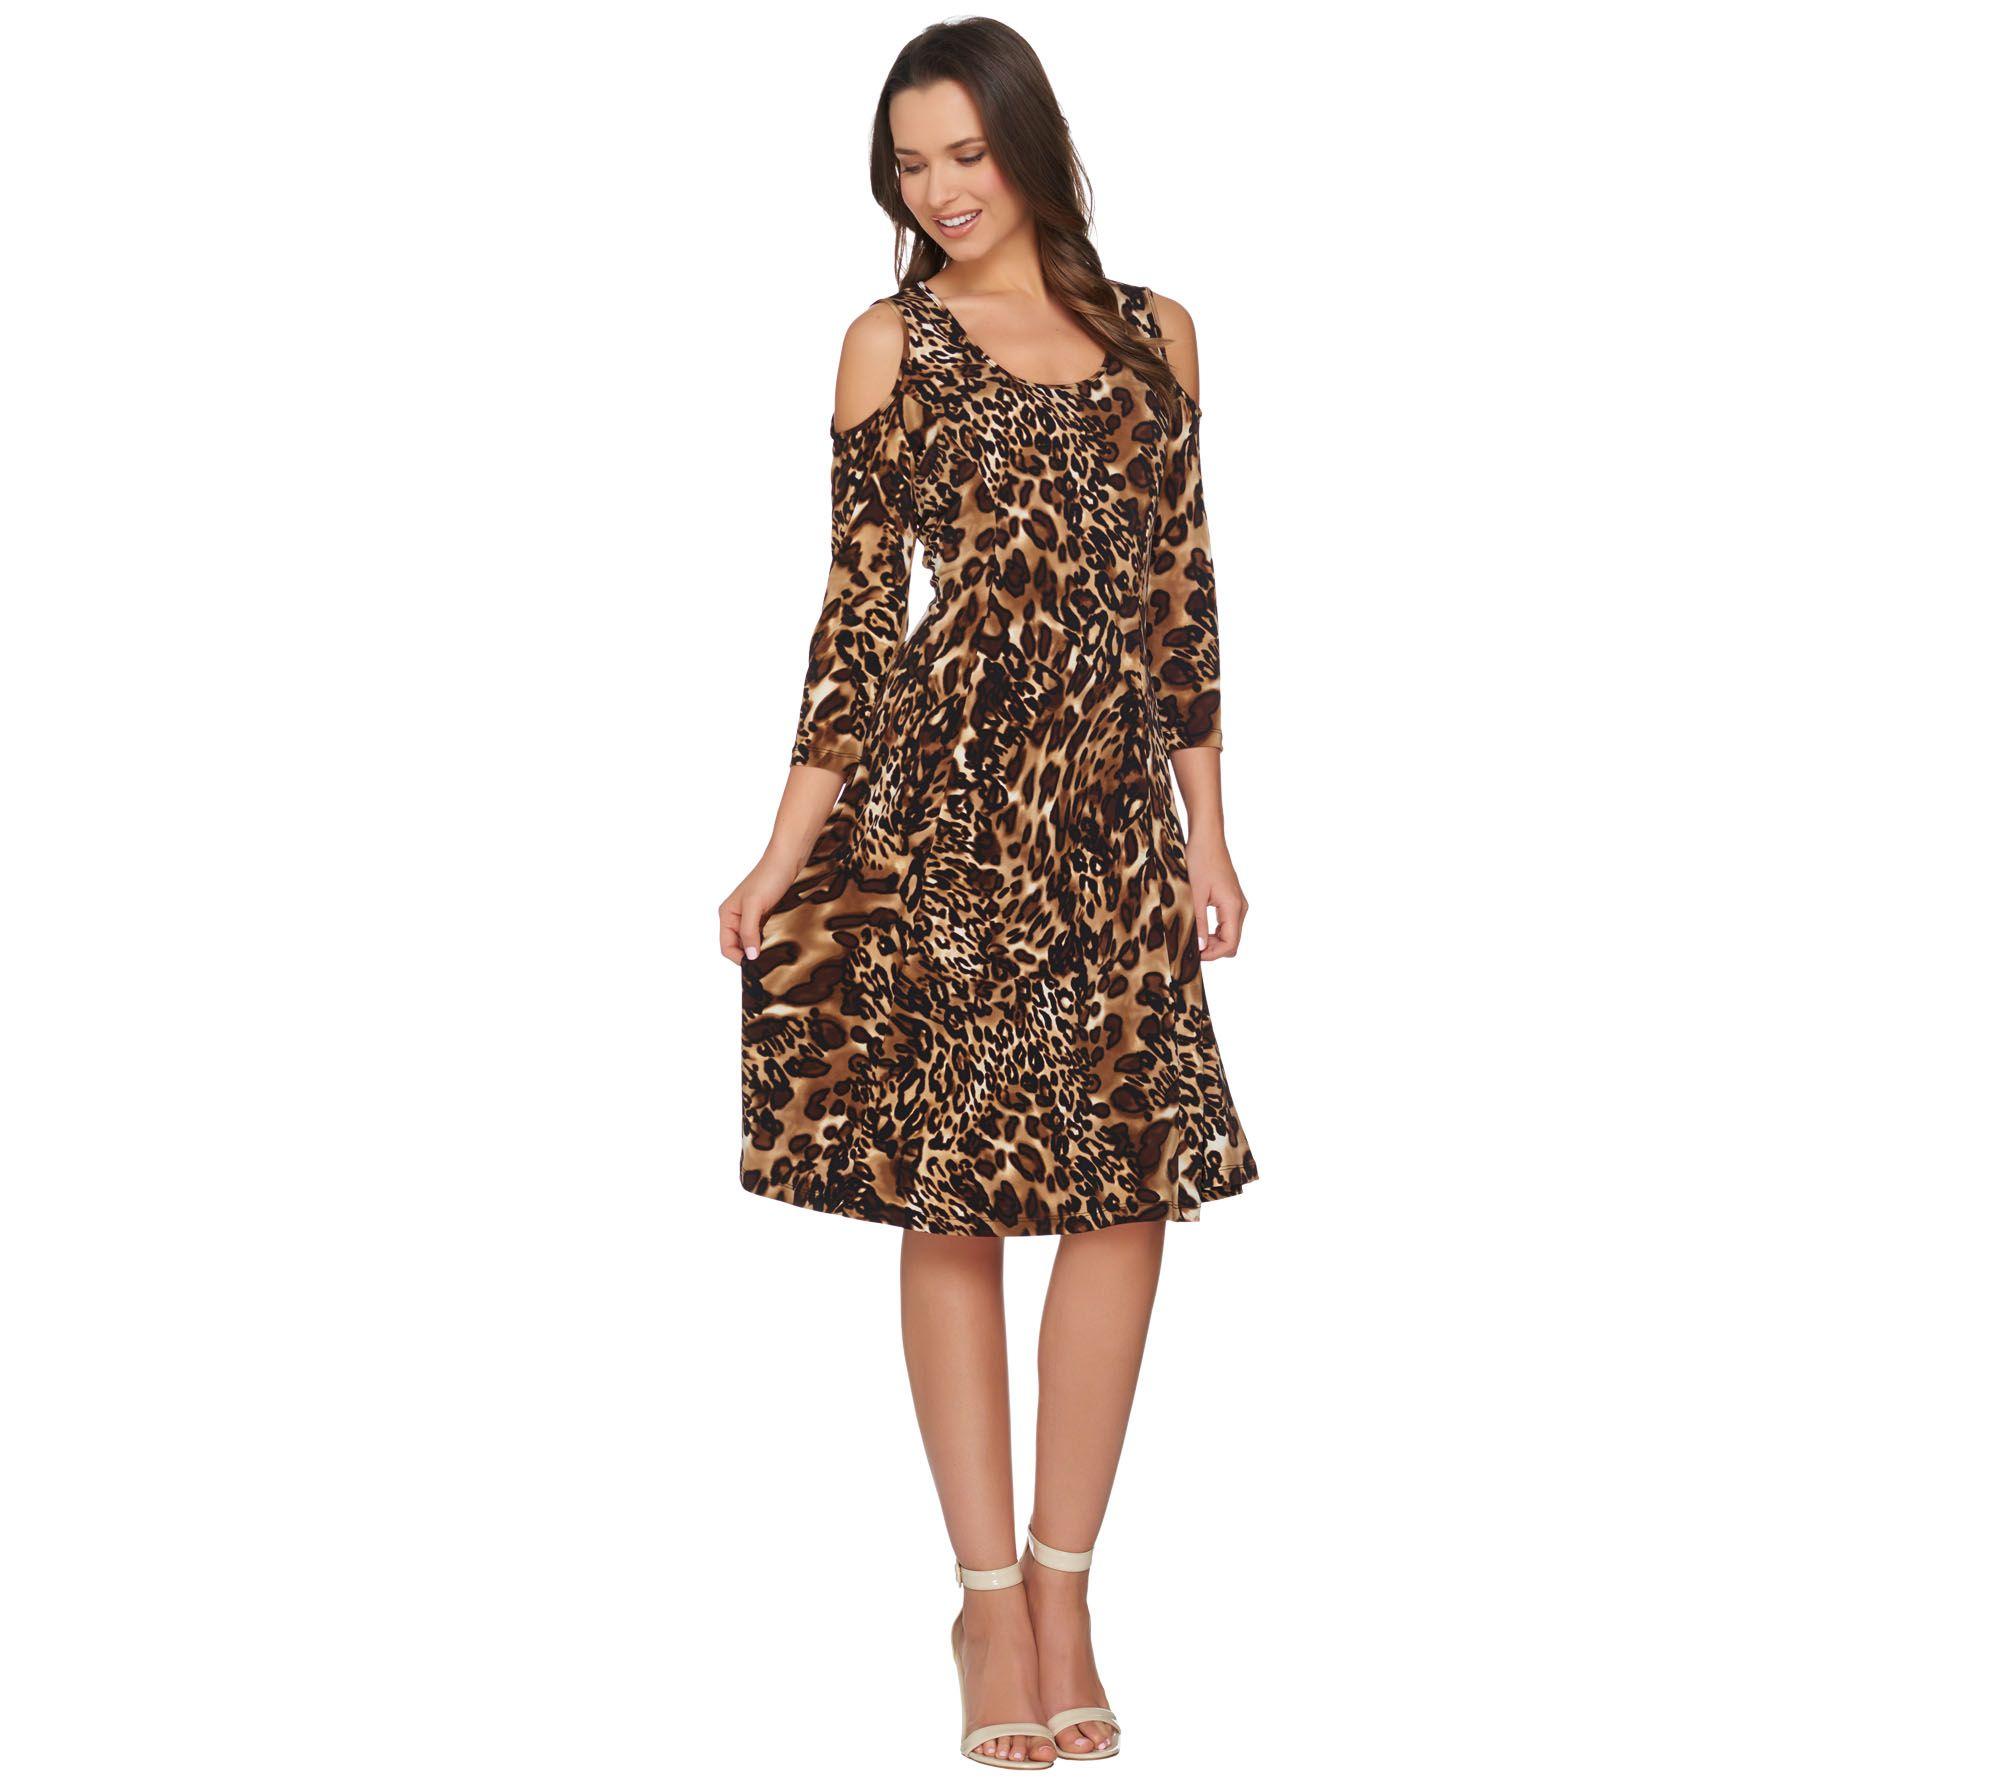 7ec85b0bbb Susan Graver Liquid Knit 3/4 Sleeve Cold Shoulder Dress - Page 1 — QVC.com